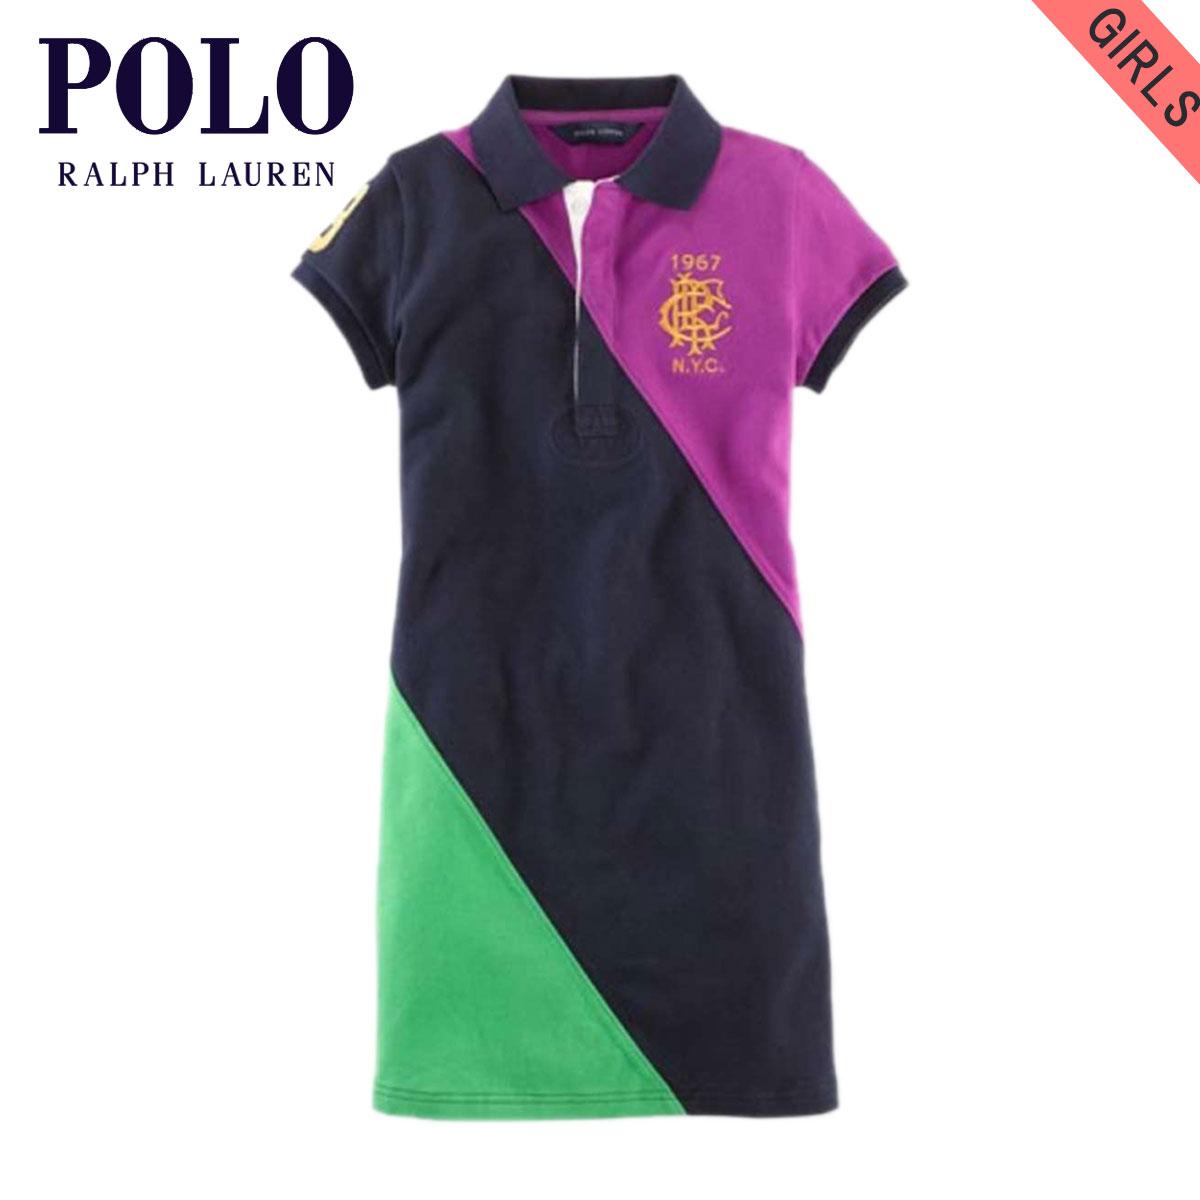 32877c5e0bd6 Poloralflorenkids POLO RALPH LAUREN CHILDREN genuine kids clothing girls  Polo COLOR-BLOCKED POLO DRESS 51439246